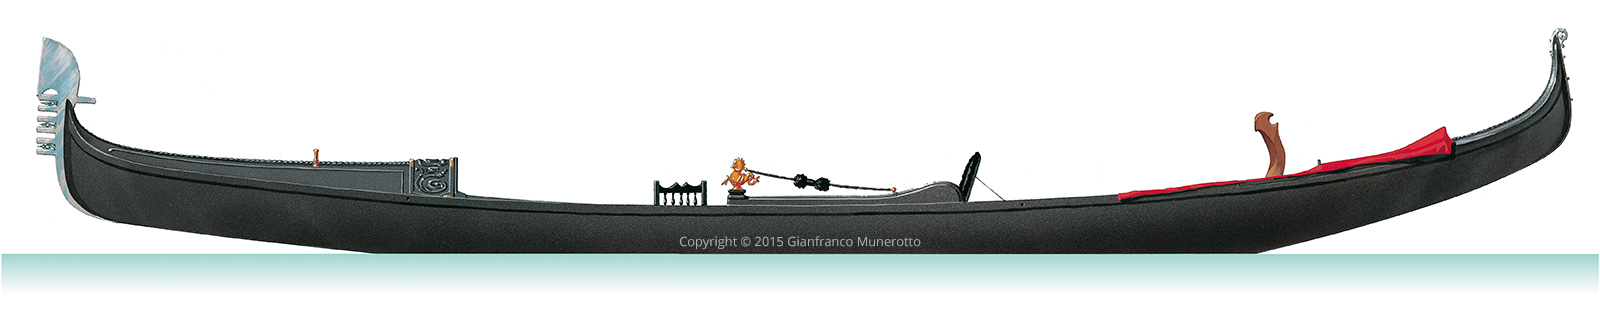 gondola-900-gianfranco-munarotto